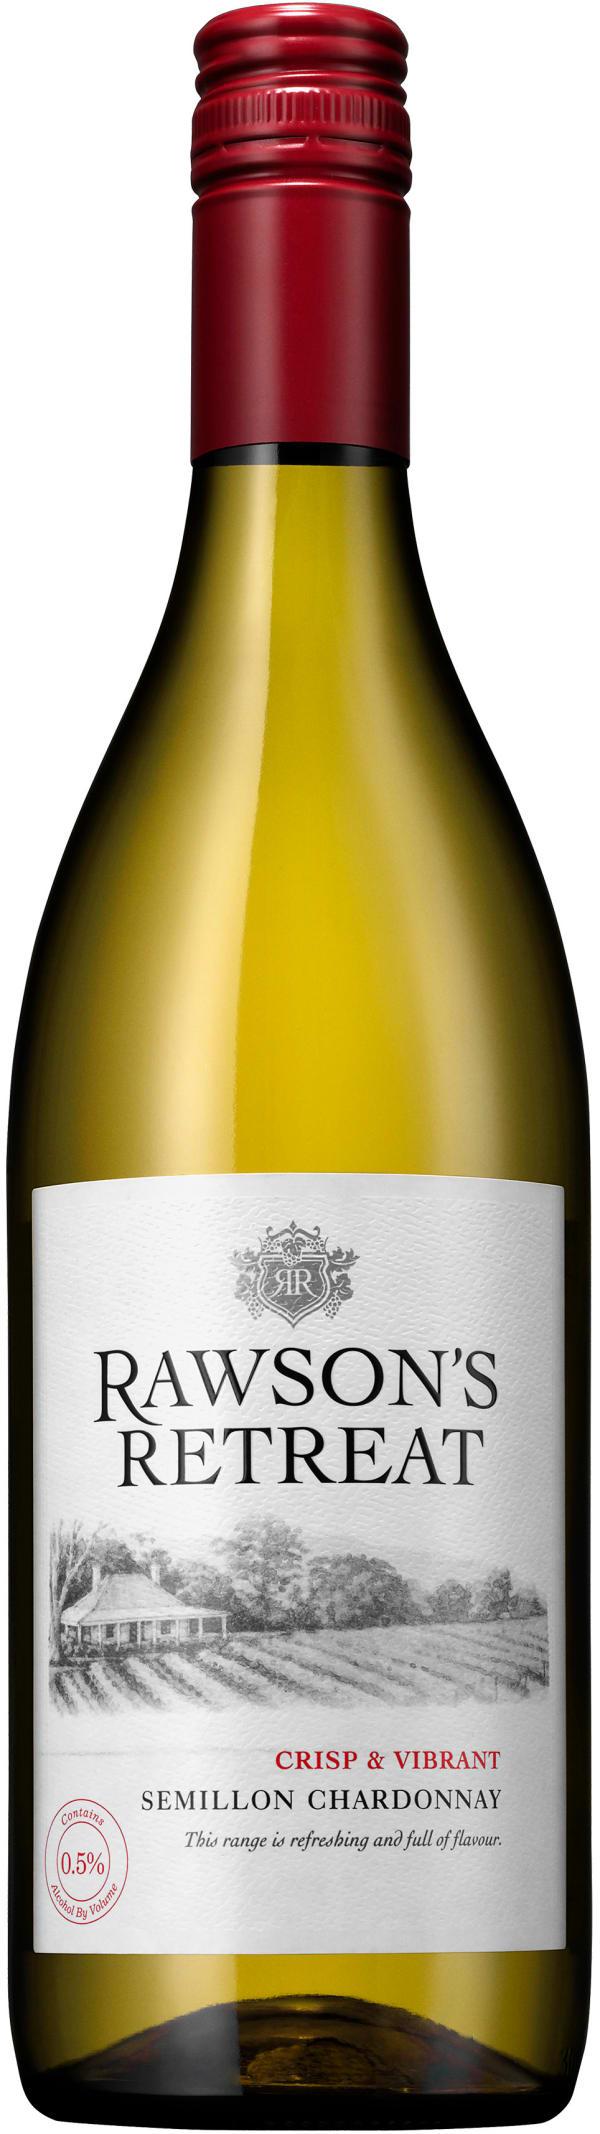 Rawson's Retreat Alcohol Free Semillon Chardonnay